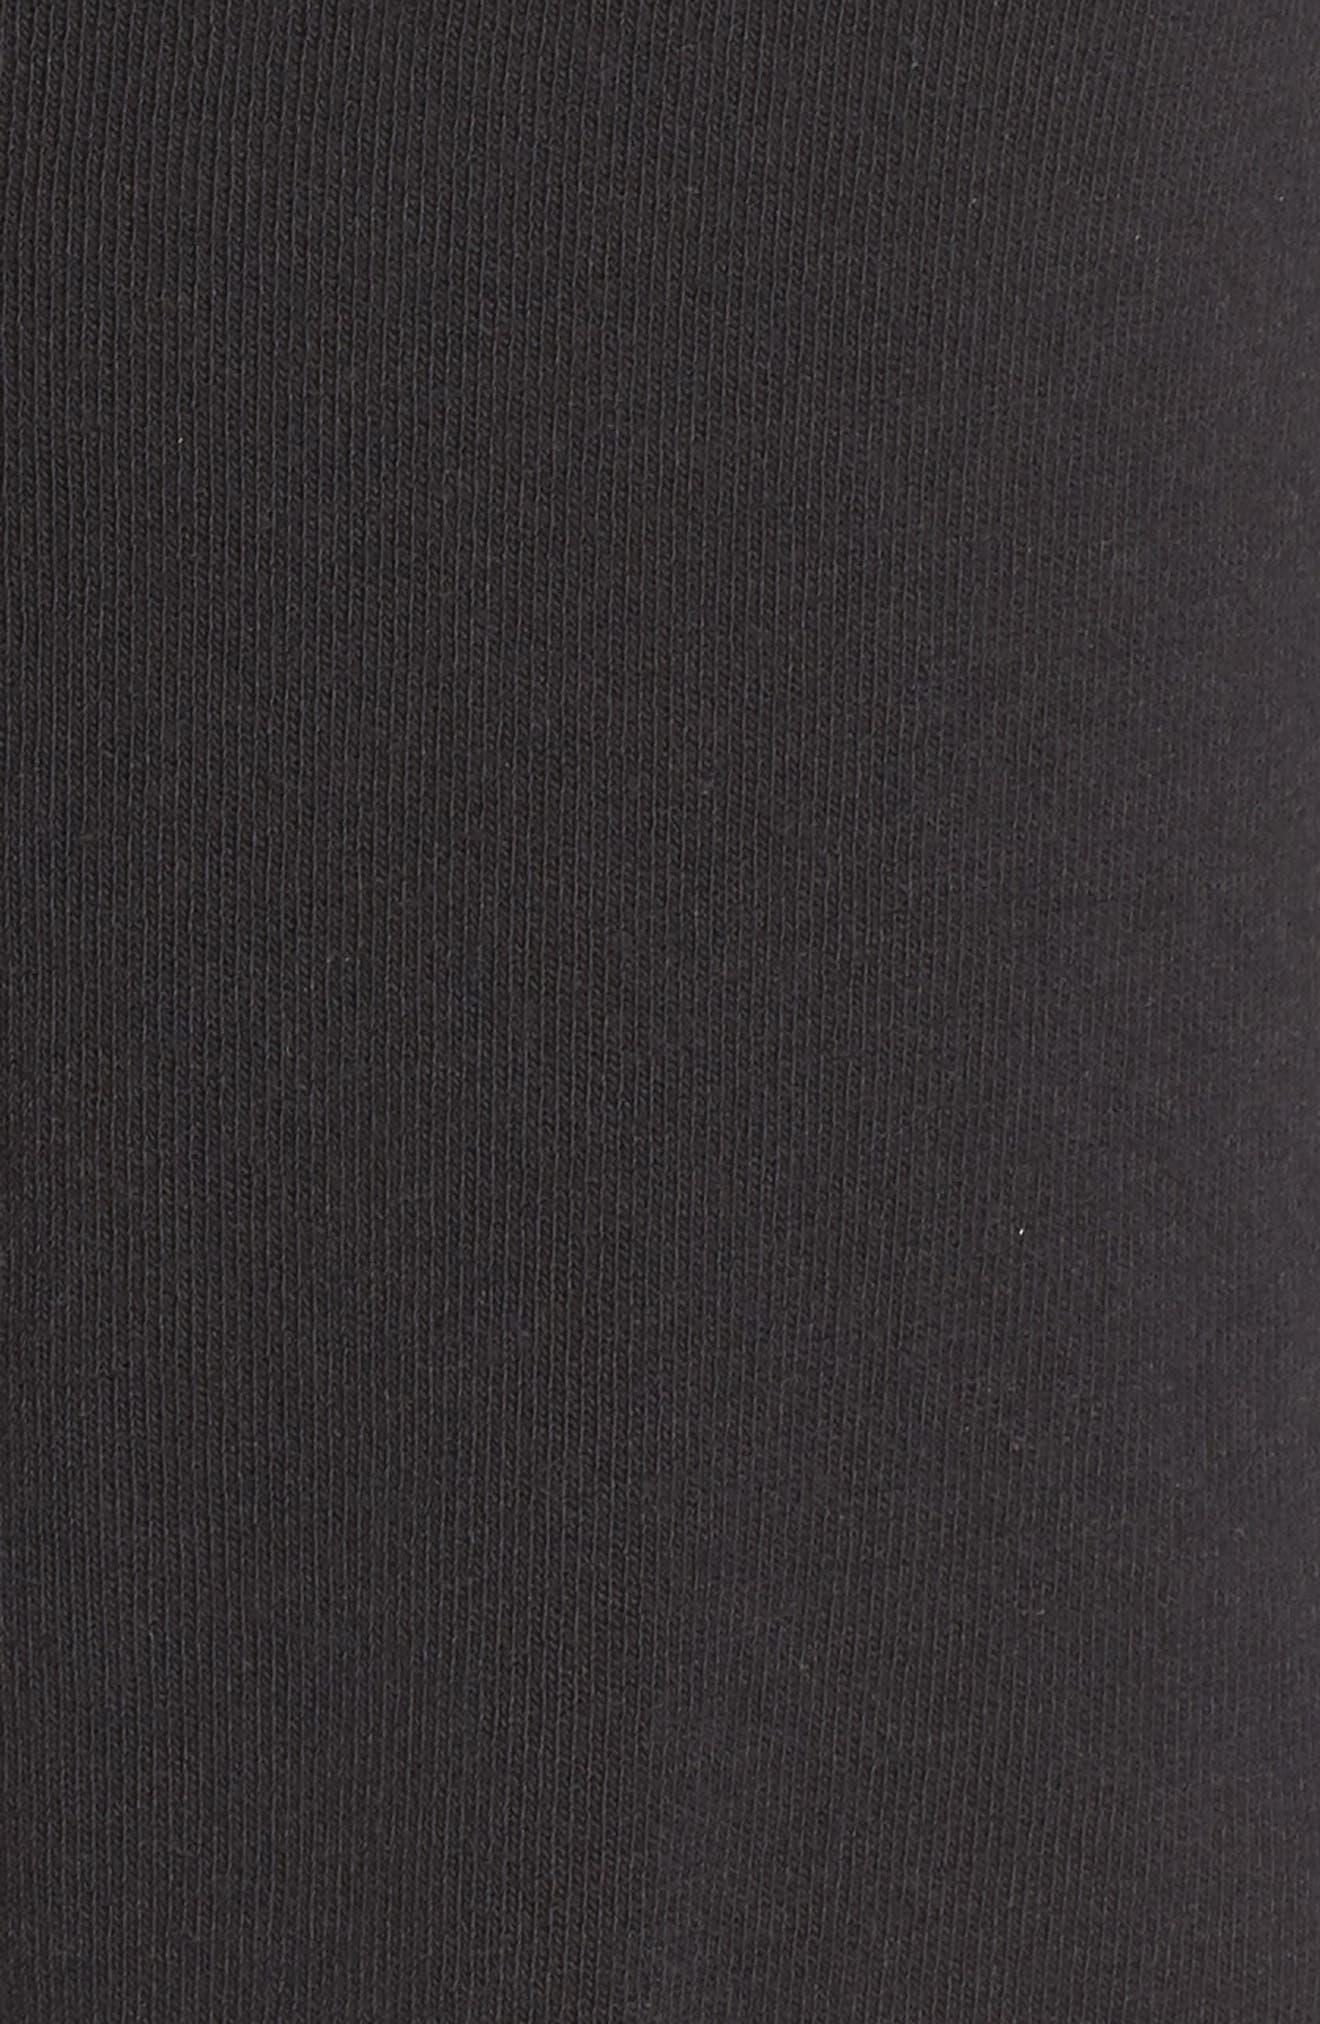 Boarder Shorts,                             Alternate thumbnail 4, color,                             Black